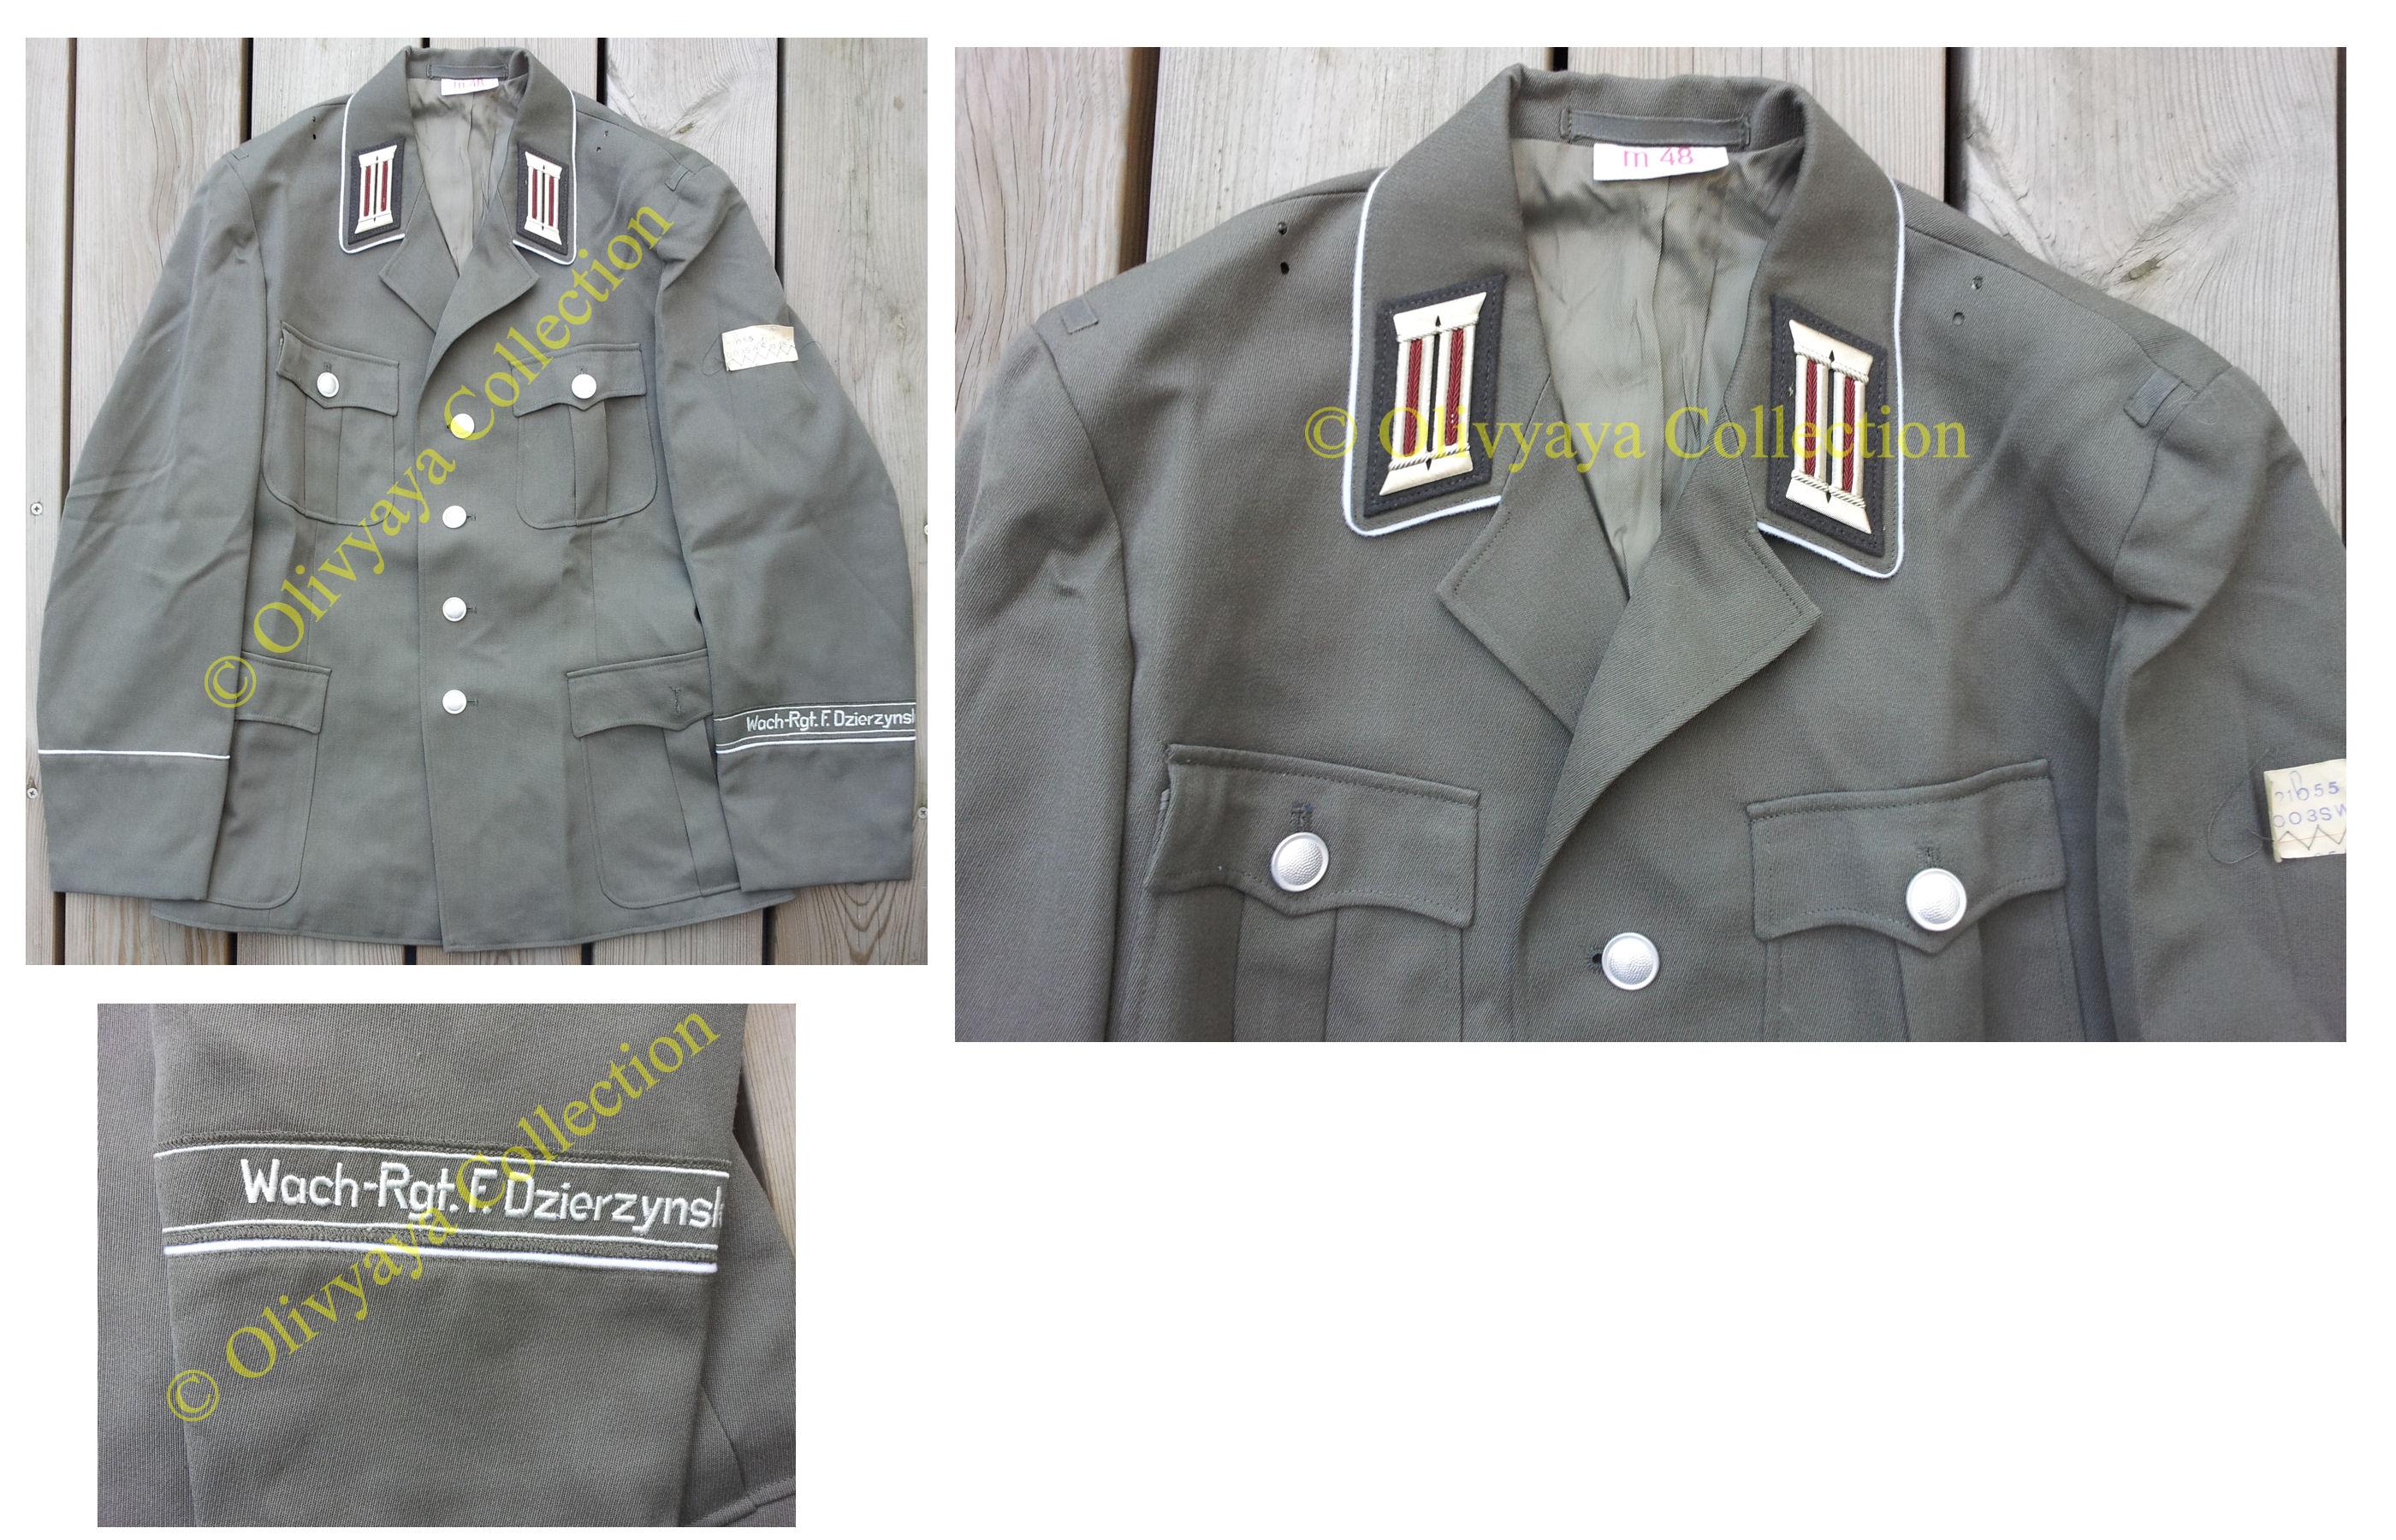 [VENDUE] Veste Wach-Regiment F. Dzierzynski 652960VesteDzierjynsky2